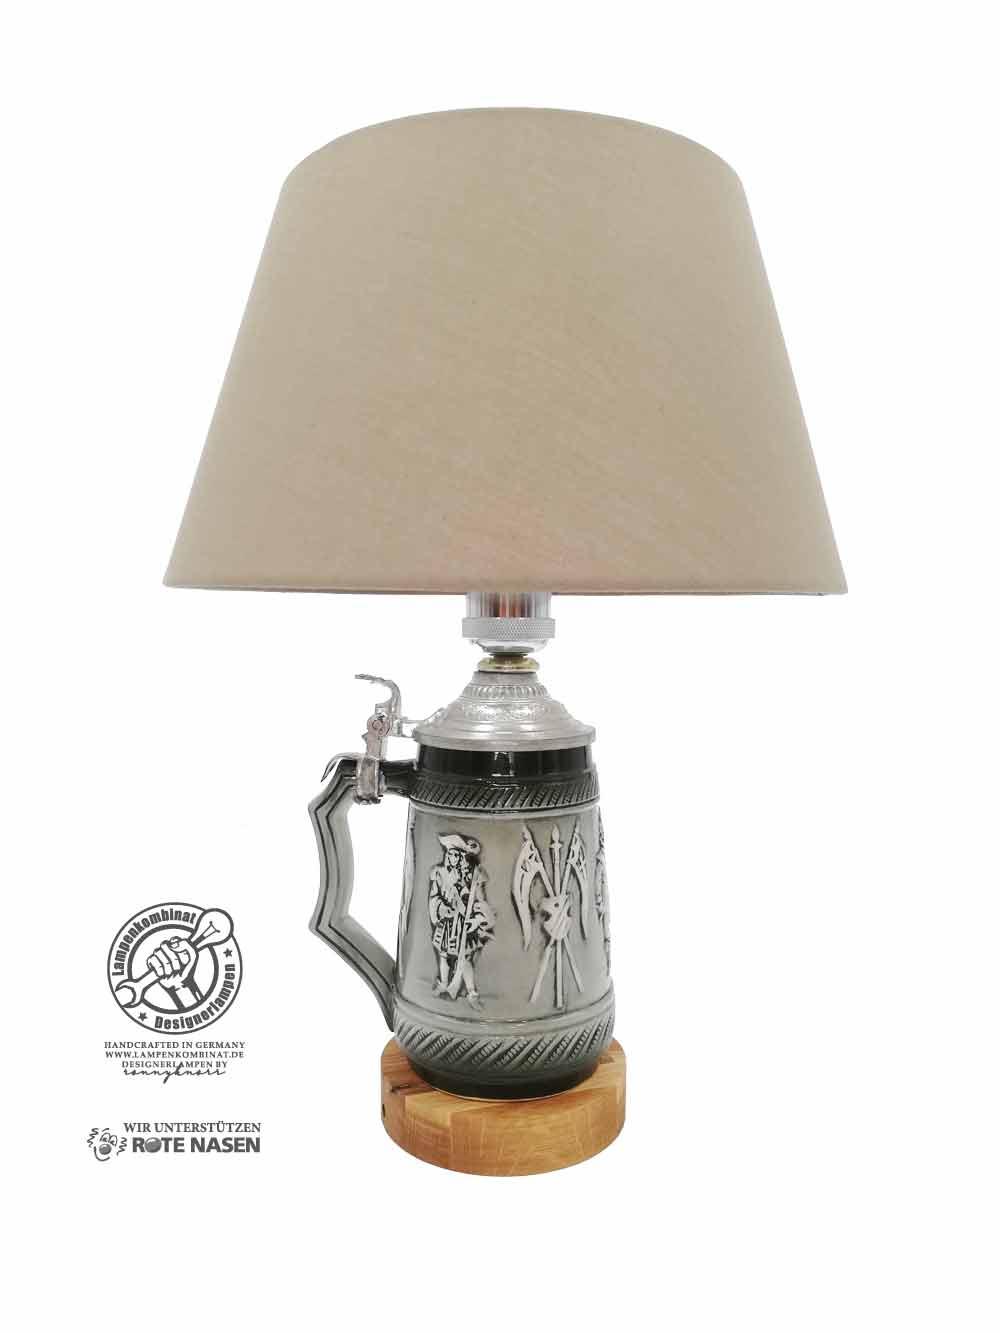 Bierkruglampe